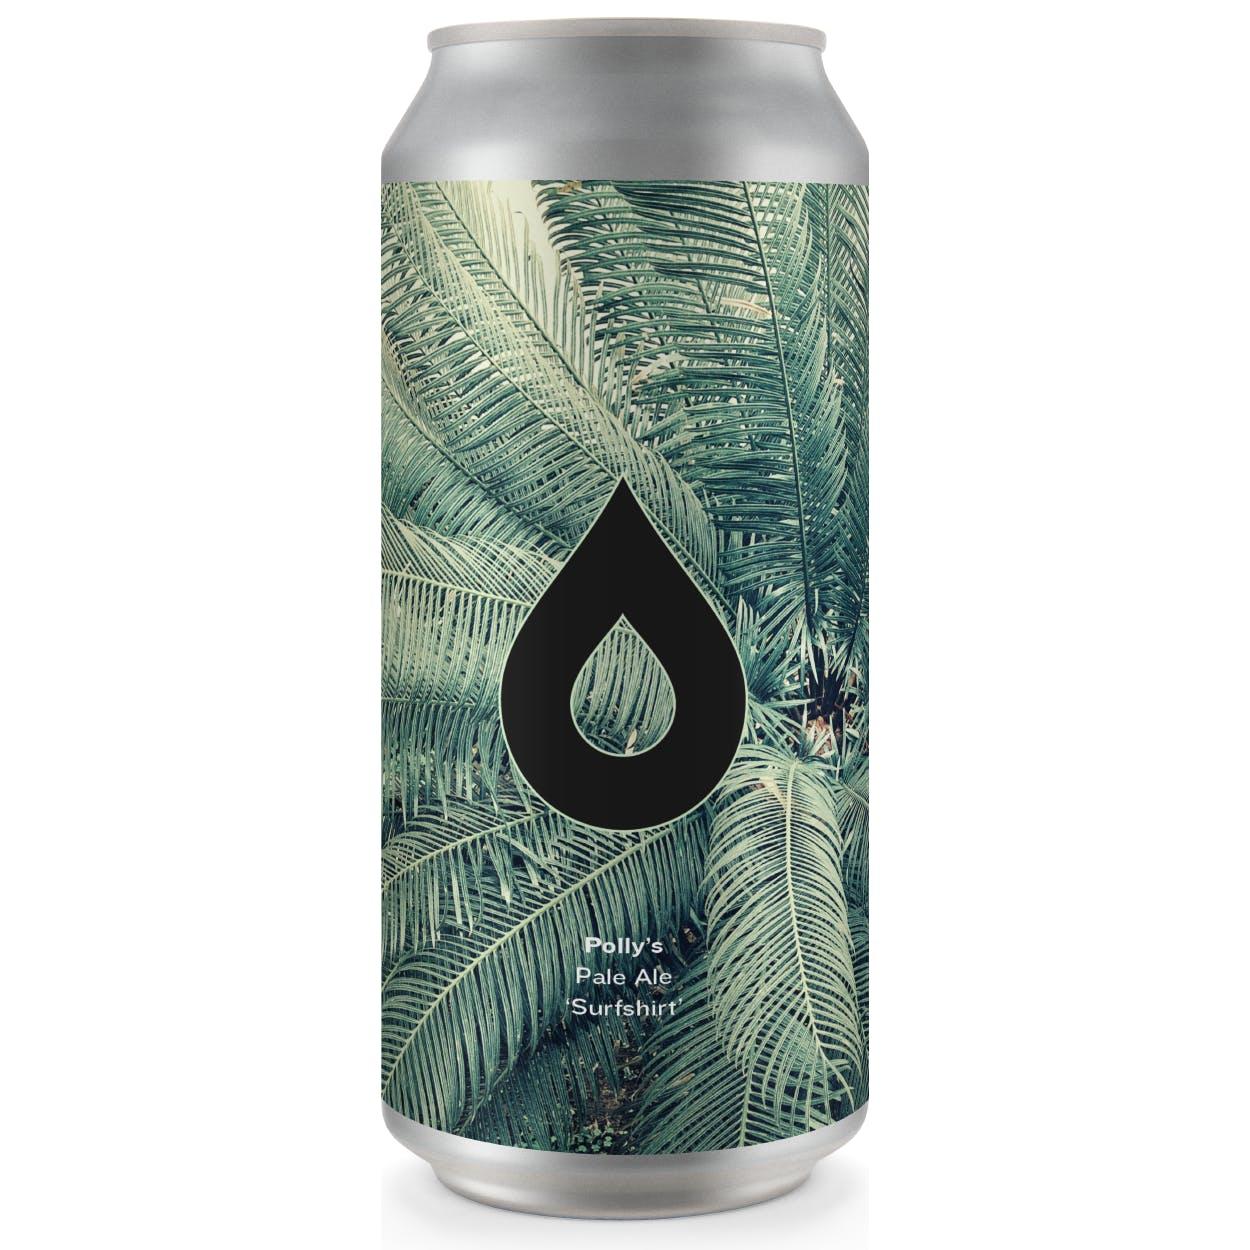 Surfshirt - Kveik Pale Ale 5.2% 440ml Polly's Brew